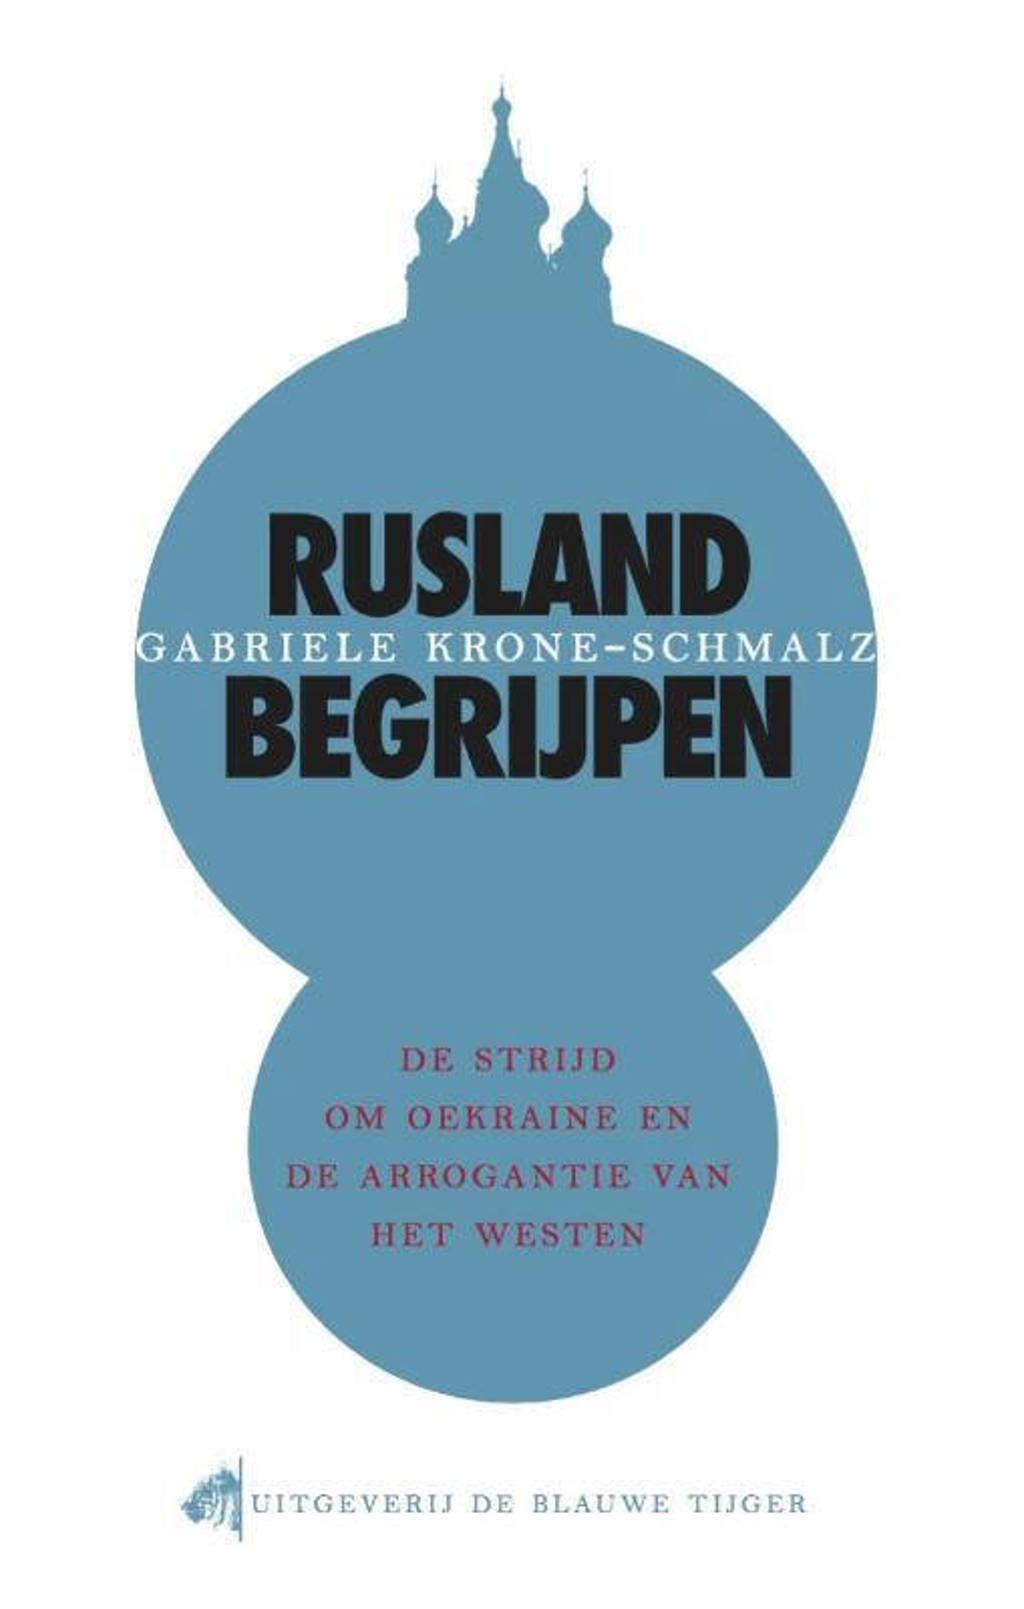 Rusland begrijpen - Gabriele Krone-Schmalz